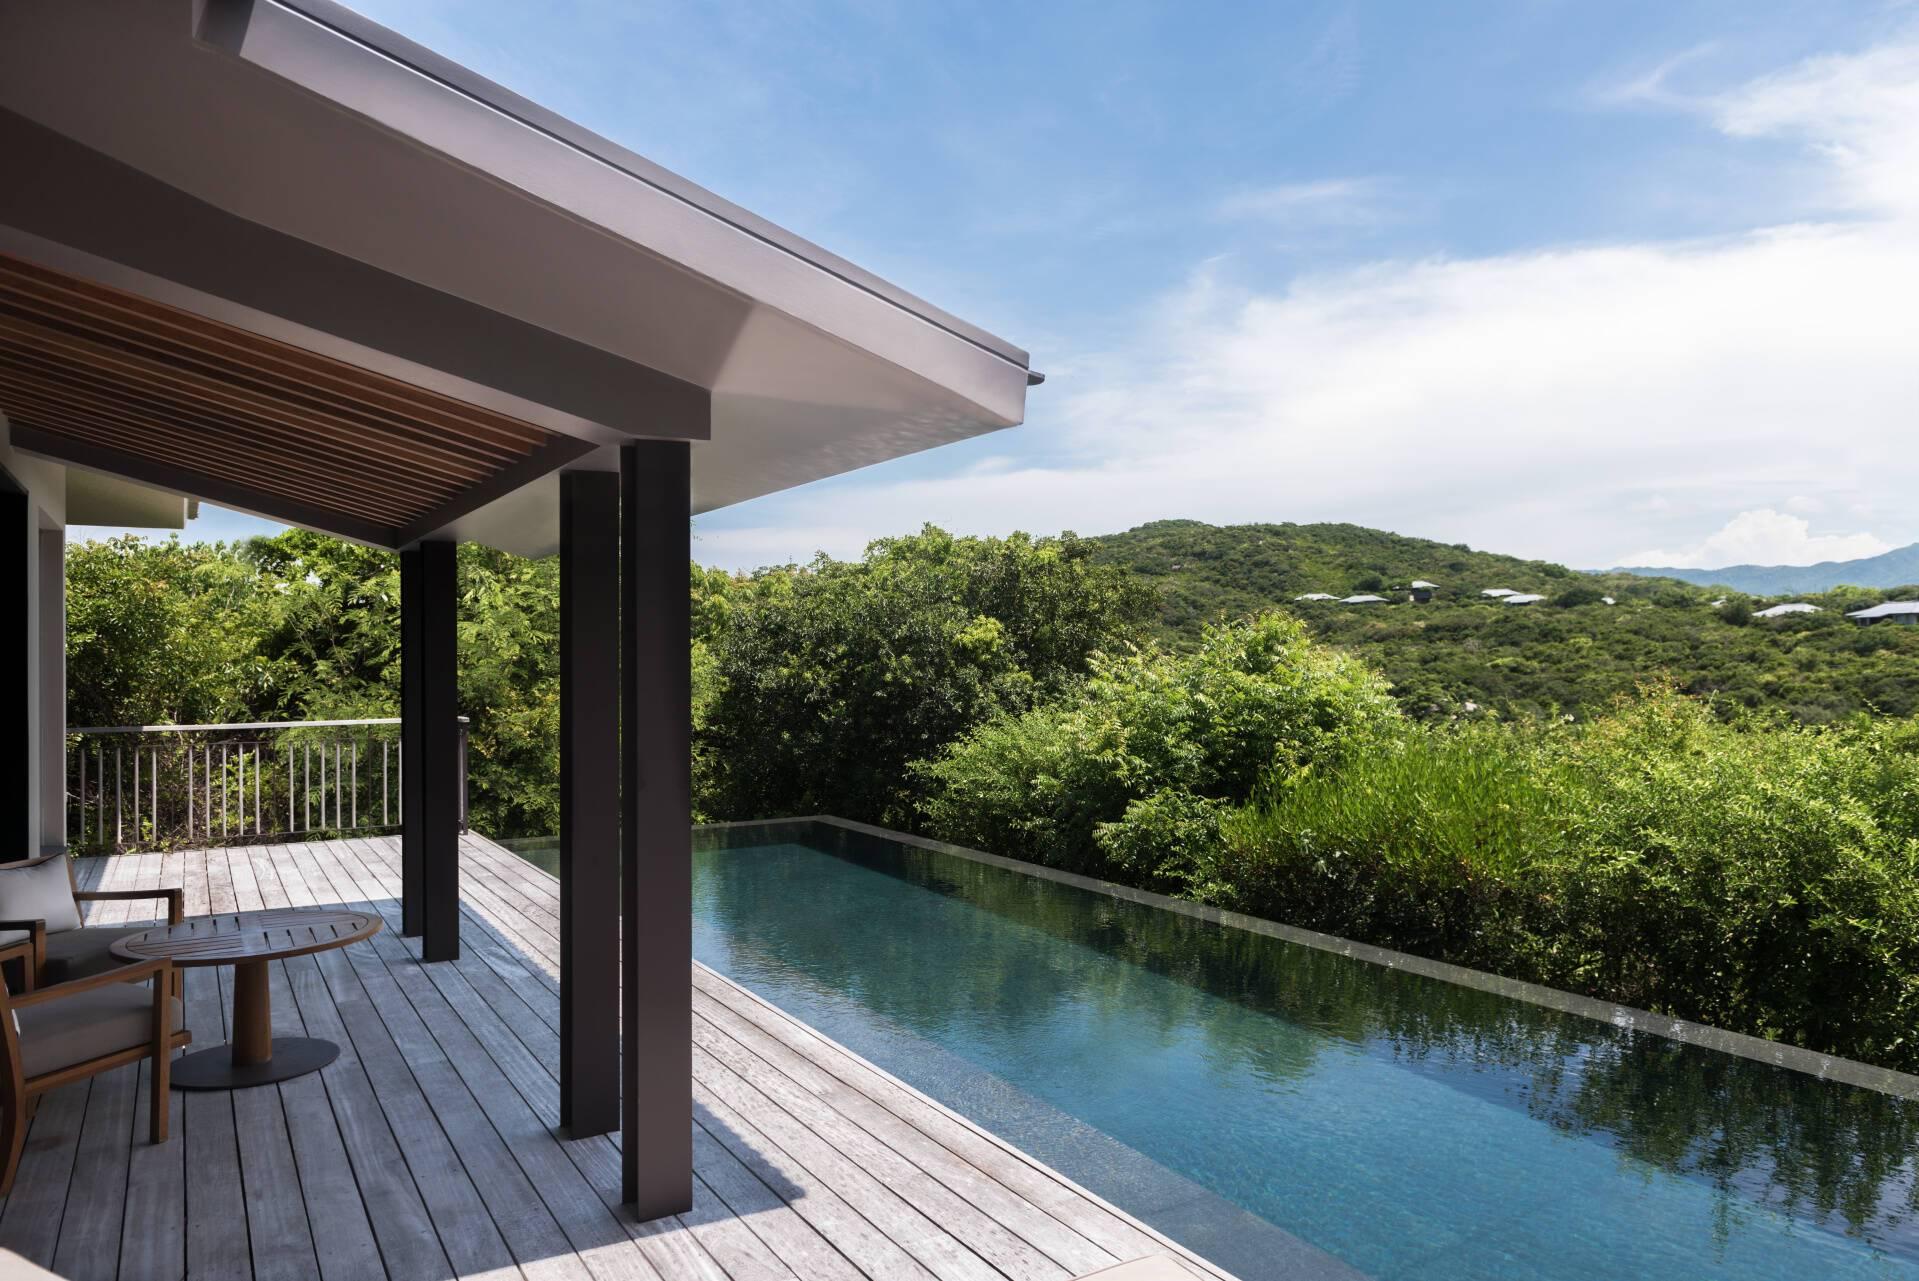 Amanoi Ocean Pool Villa Terrasse Vietnam